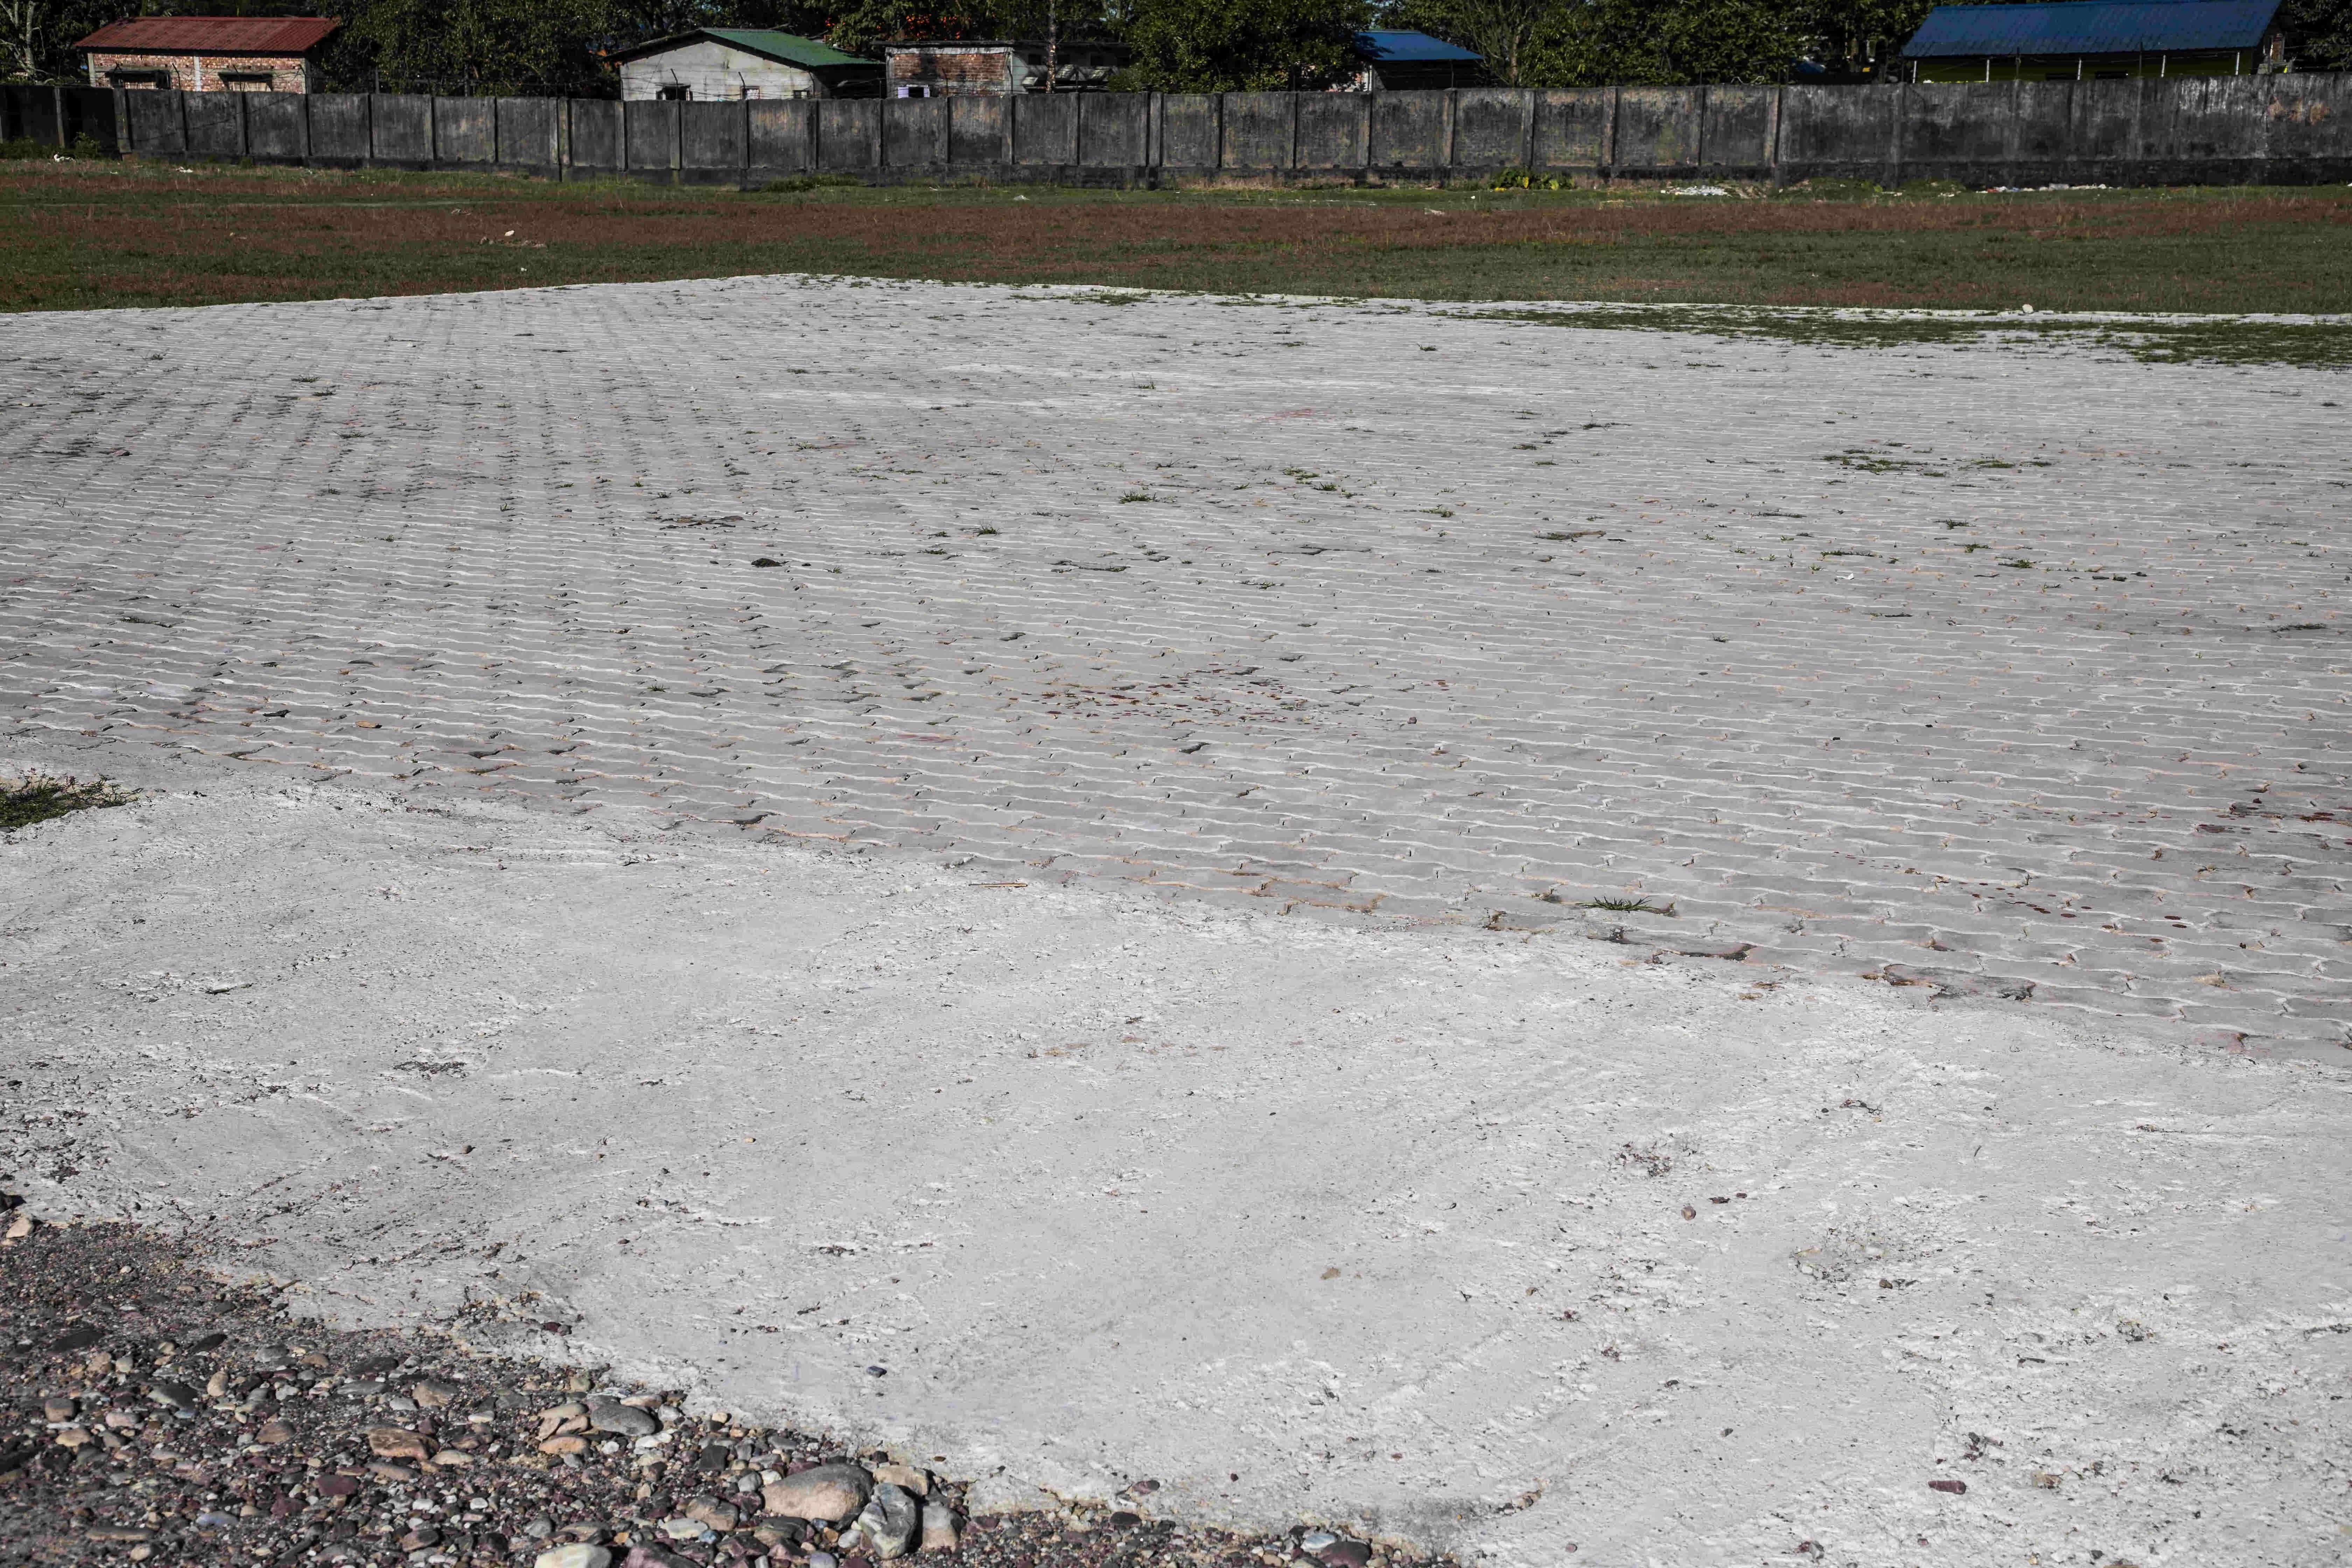 Concrete helipad on cricket pitches ! ACA shocked